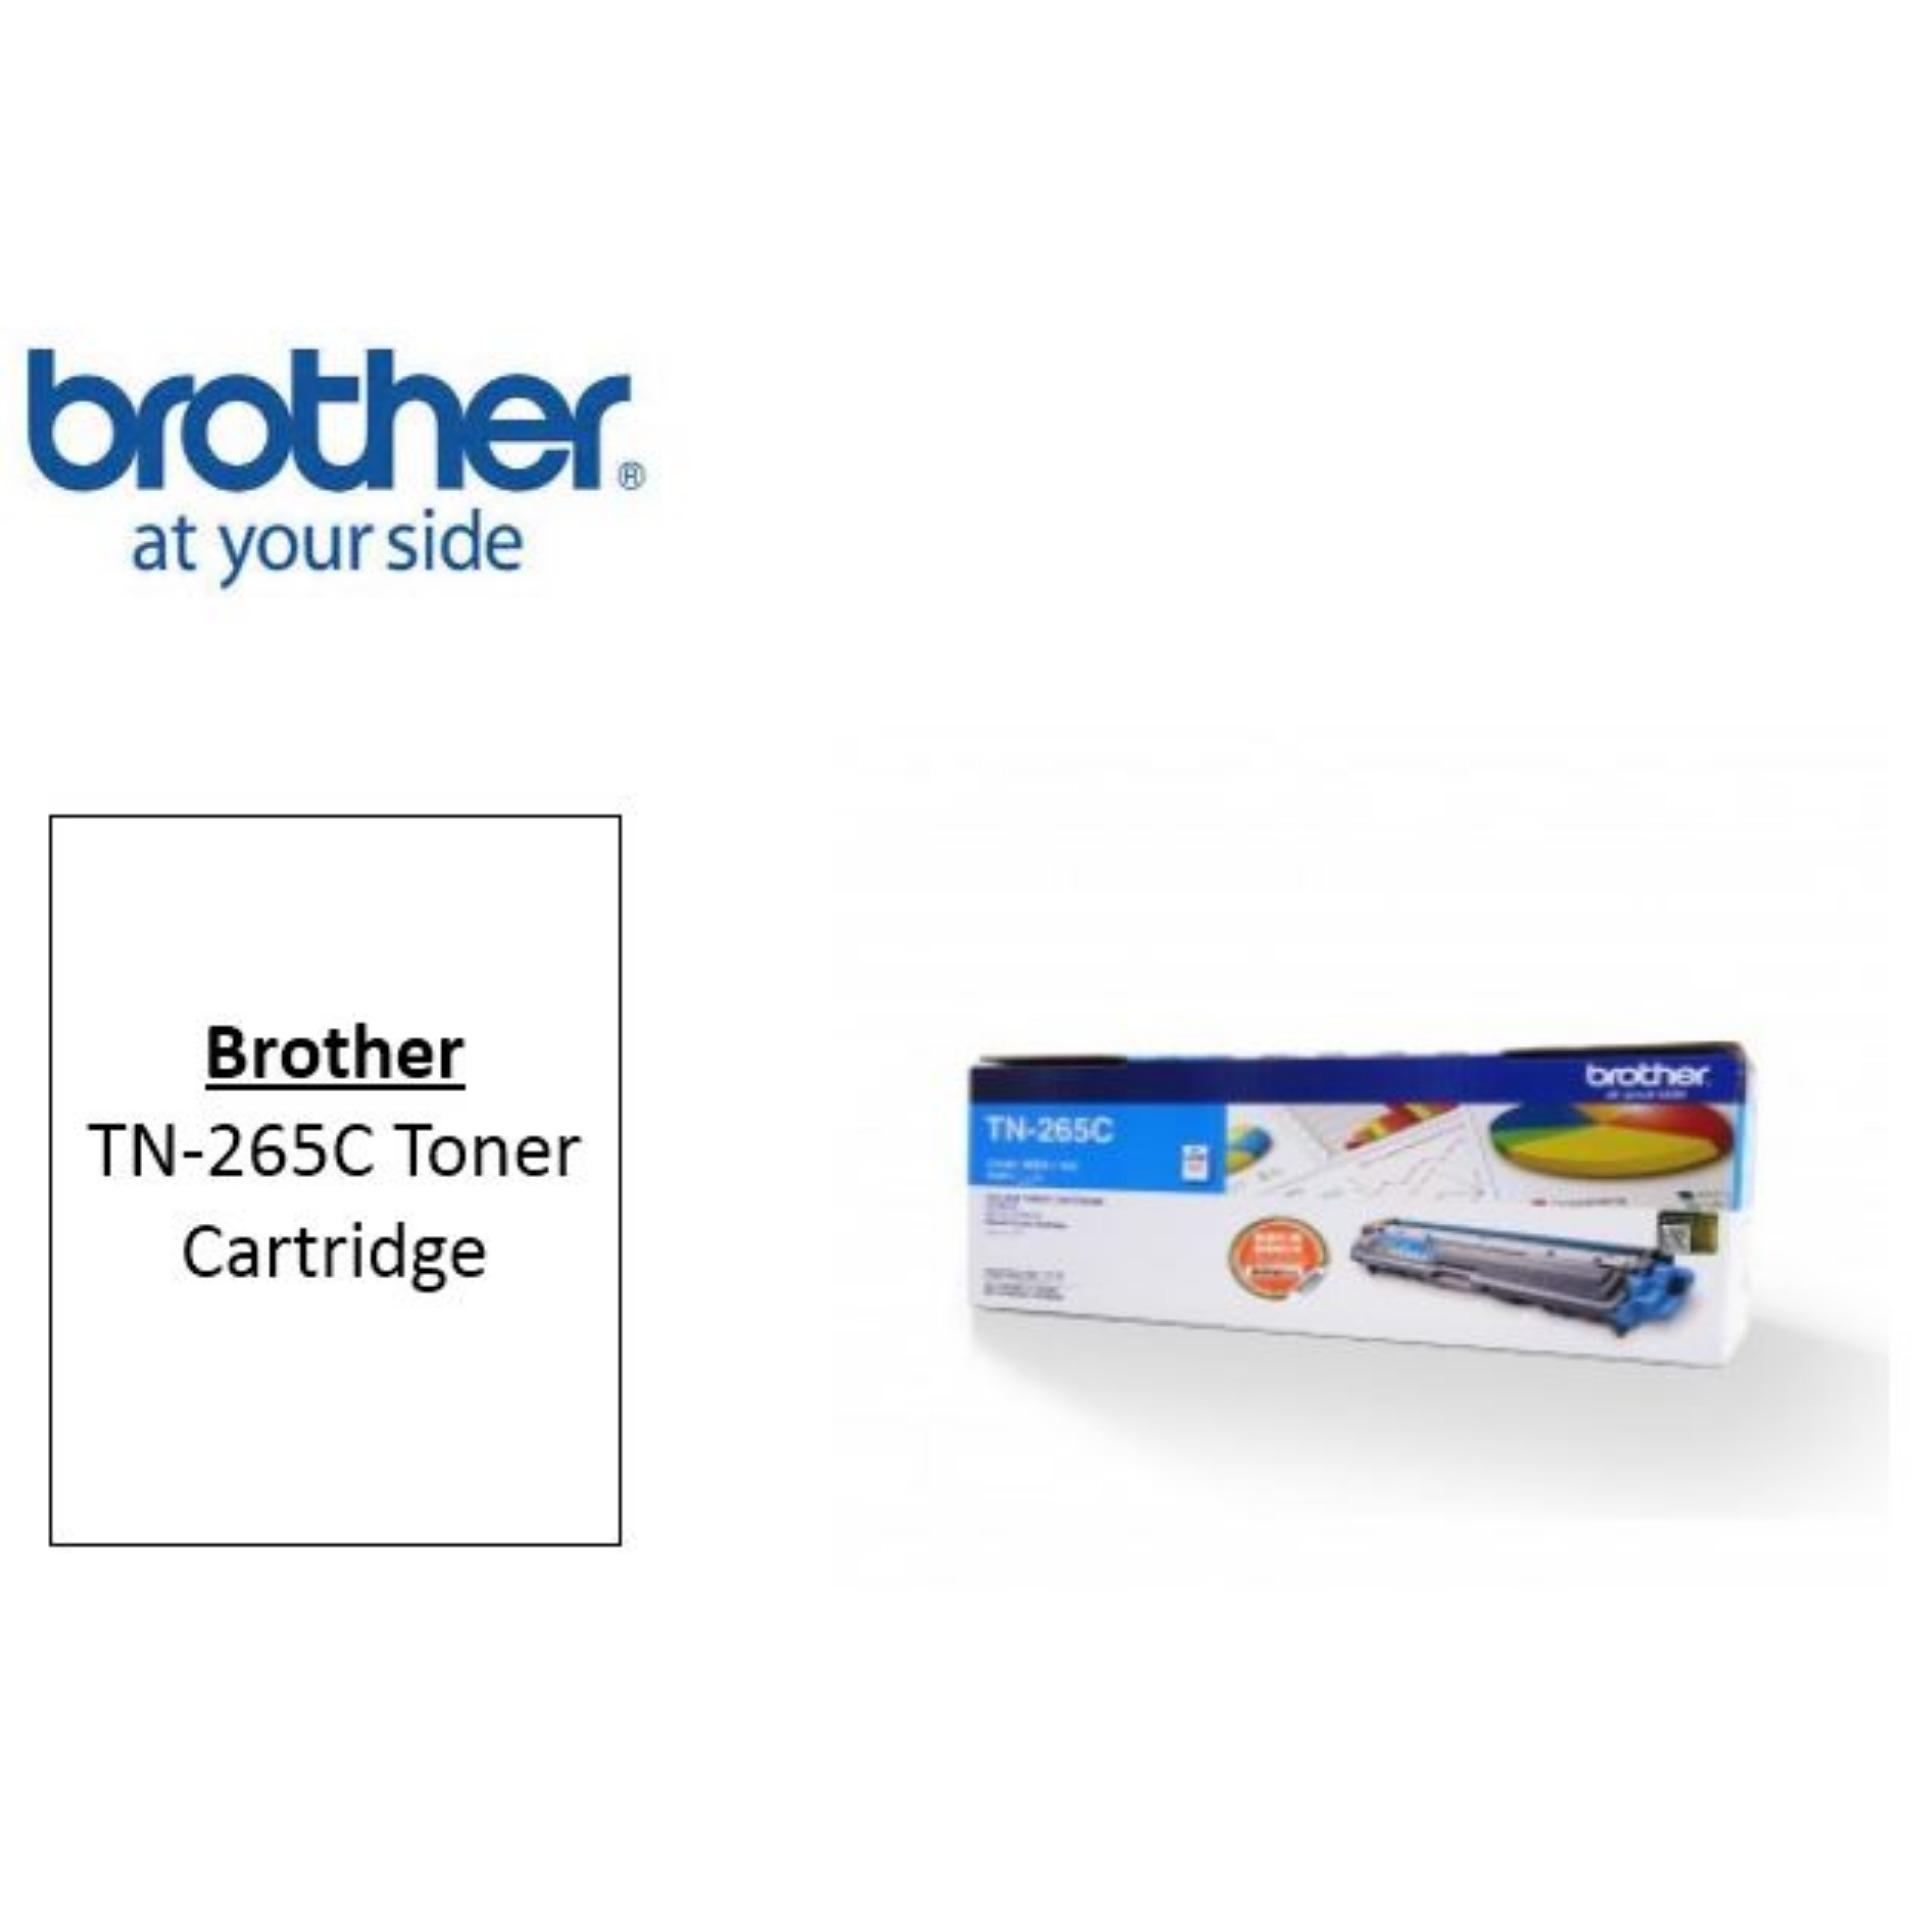 Brother Tn 265 Original Cyan Toner Cartridge Tn265 Tn 265 Hl 3150Cdn Hl 3170Cdw Mfc 9140Cdn Mfc 9330Cdw In Stock